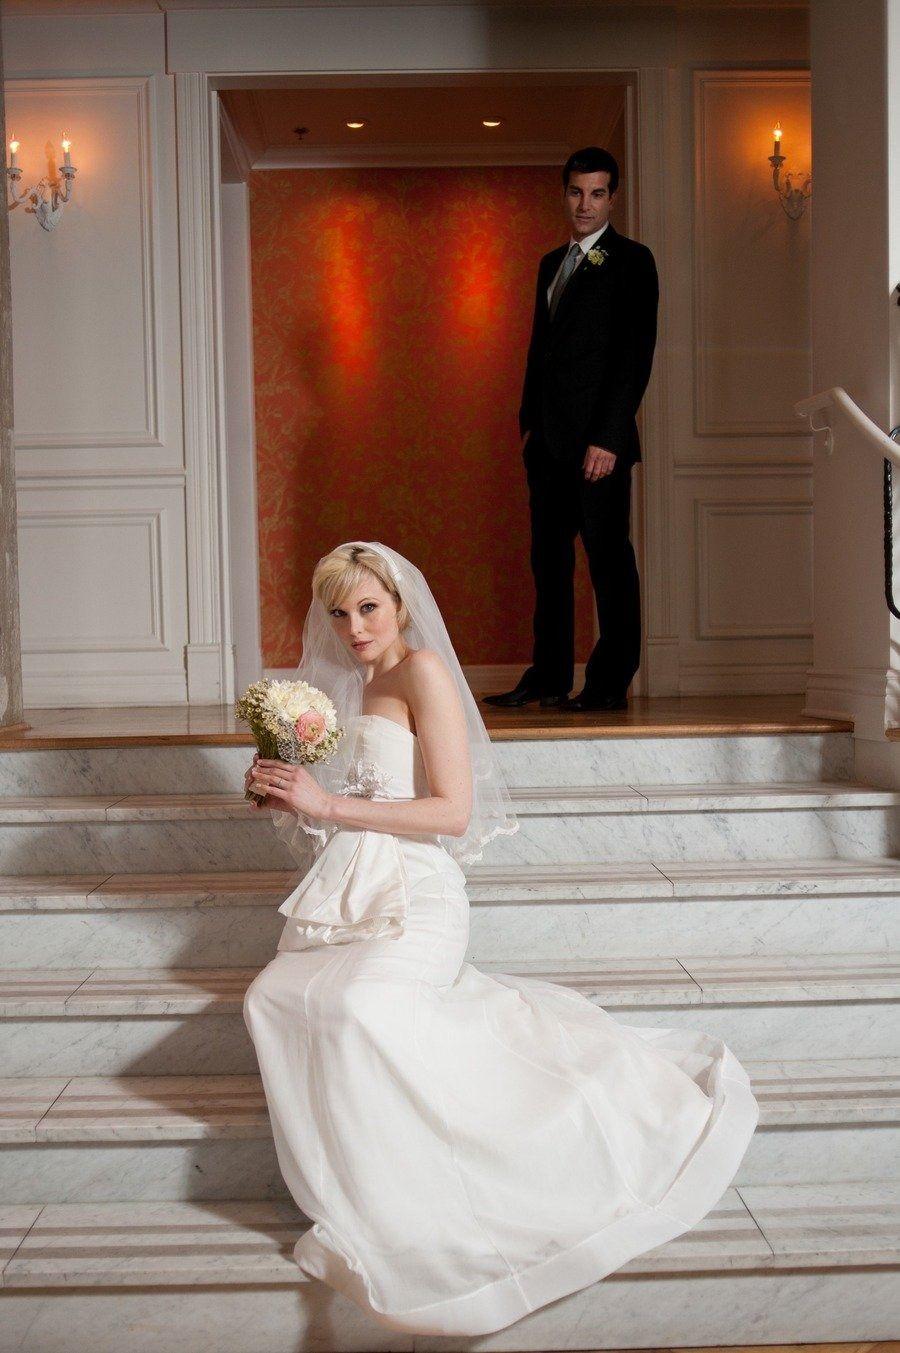 Mad men inspired wedding photo shoot by nika vaughan studio